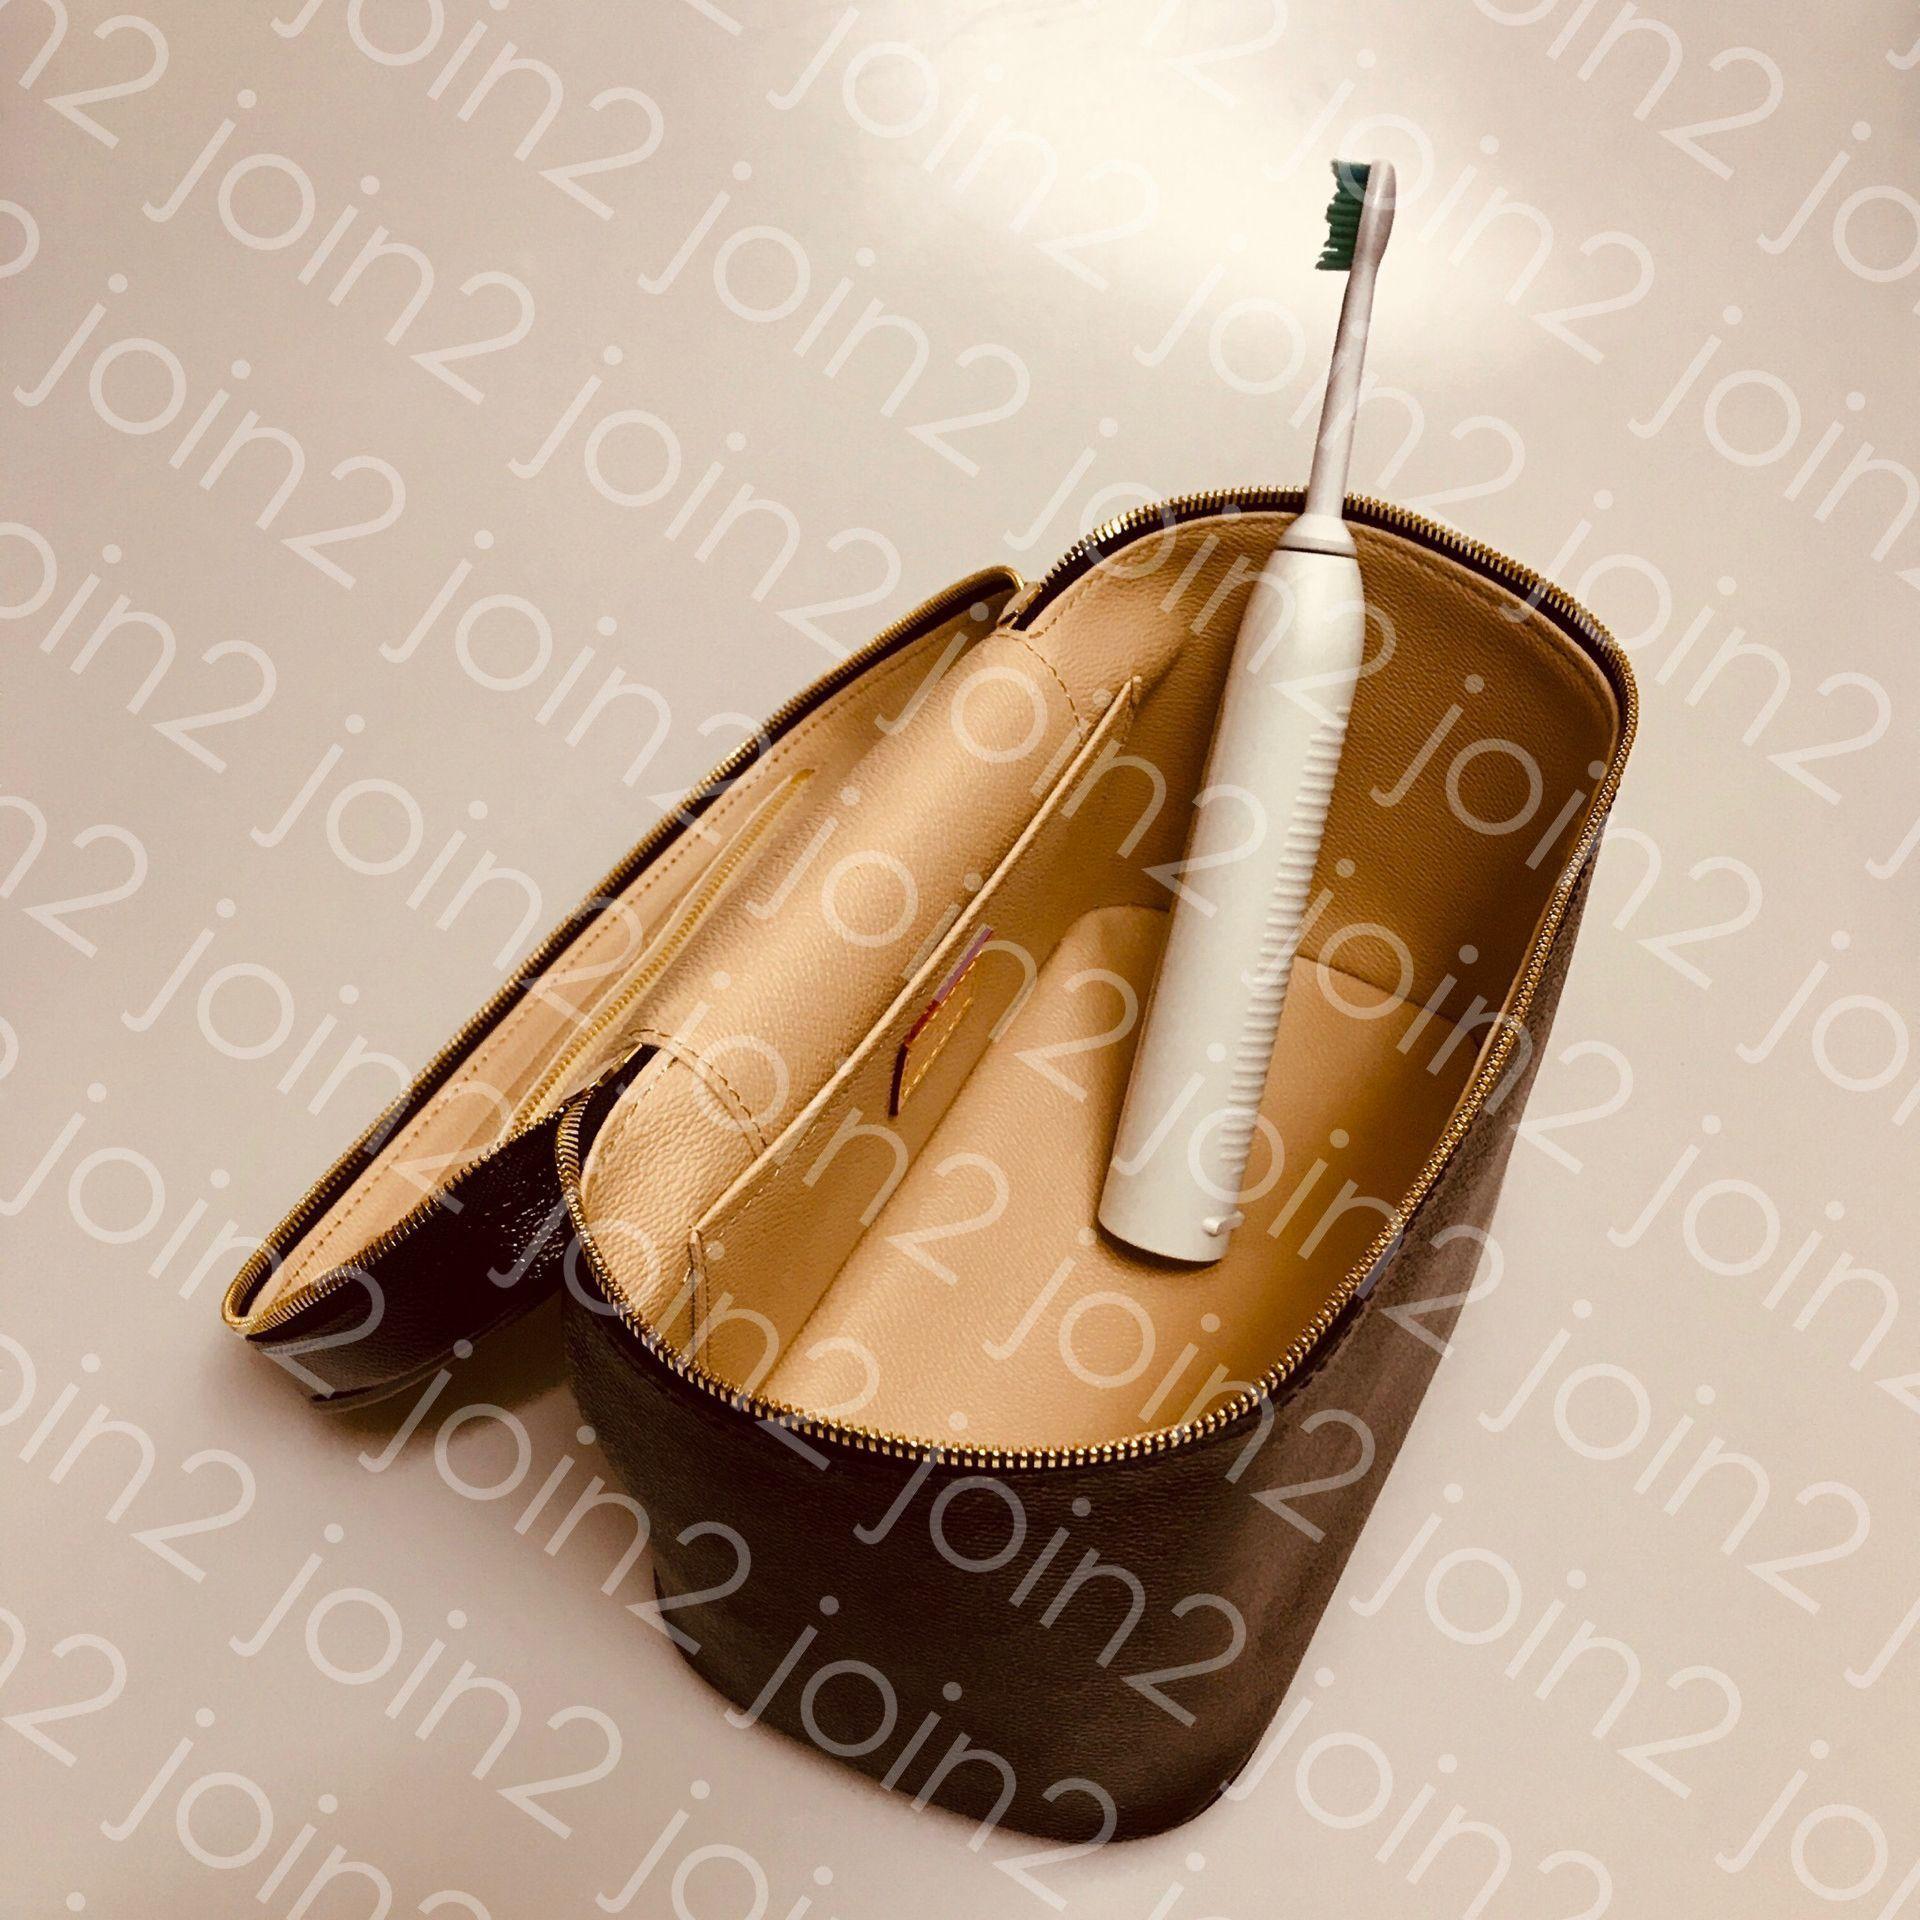 SUPERIORE. M42265 Bic BB MINI M44495 Designer Womens Beauty Case Beauty Beauty Bag Cosmetico Trucco Banco da toilette Borsa da toeletta Bag Bag Trousse de Toilette Vanity